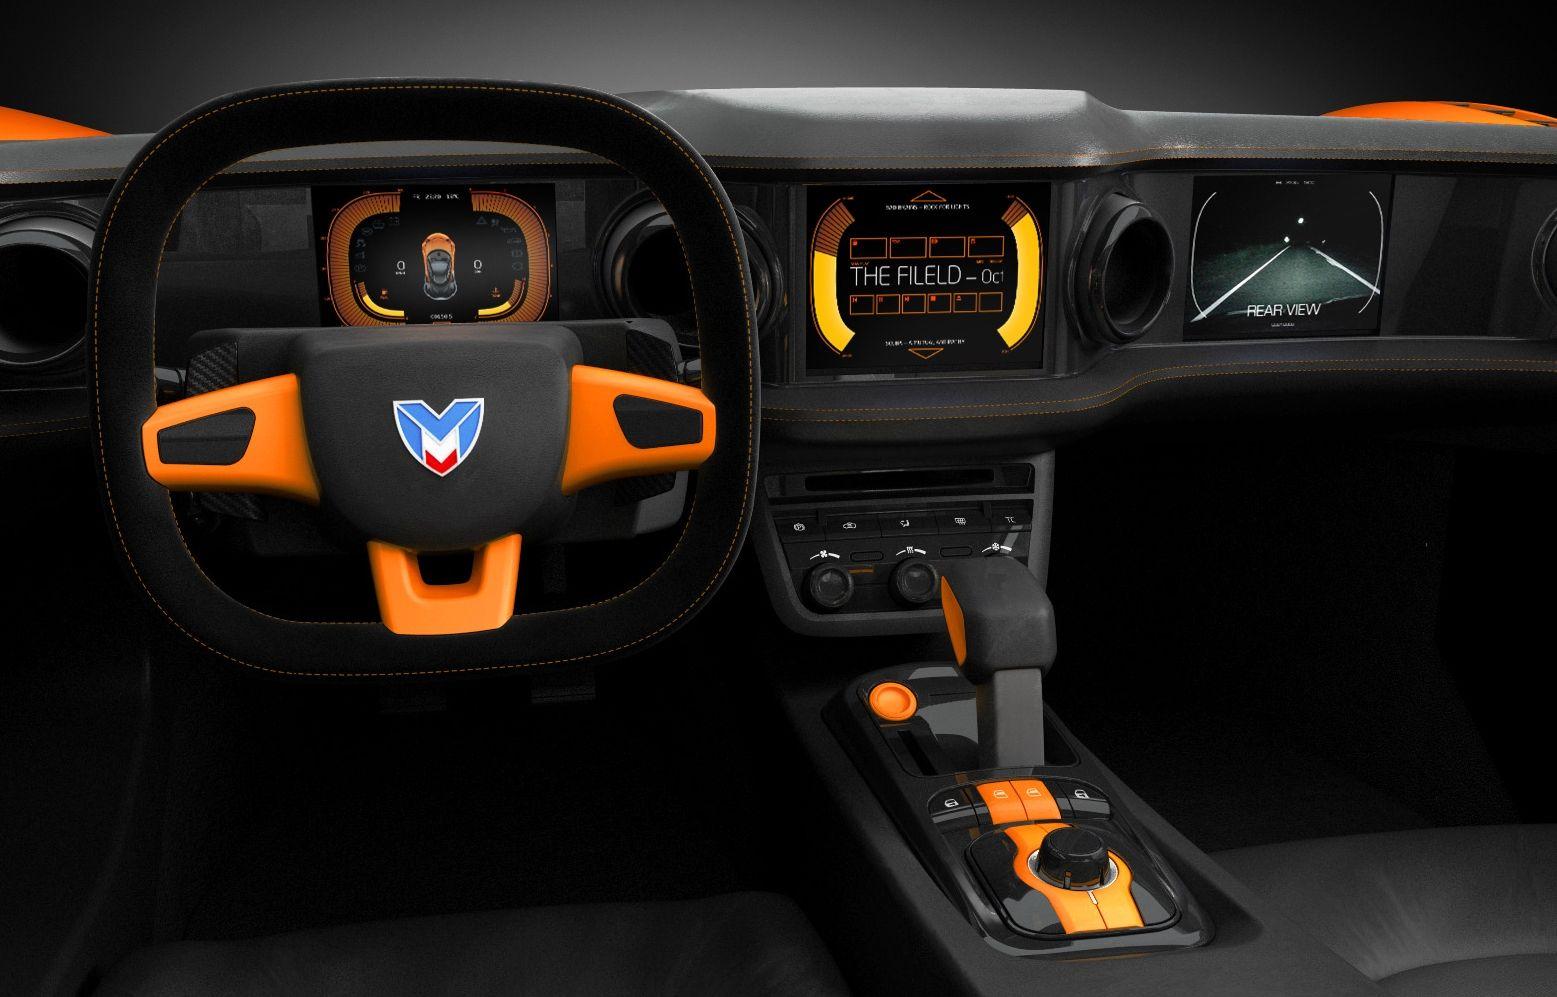 Marussia B2 interior. Mmm... | Wicked Rides | Pinterest ...